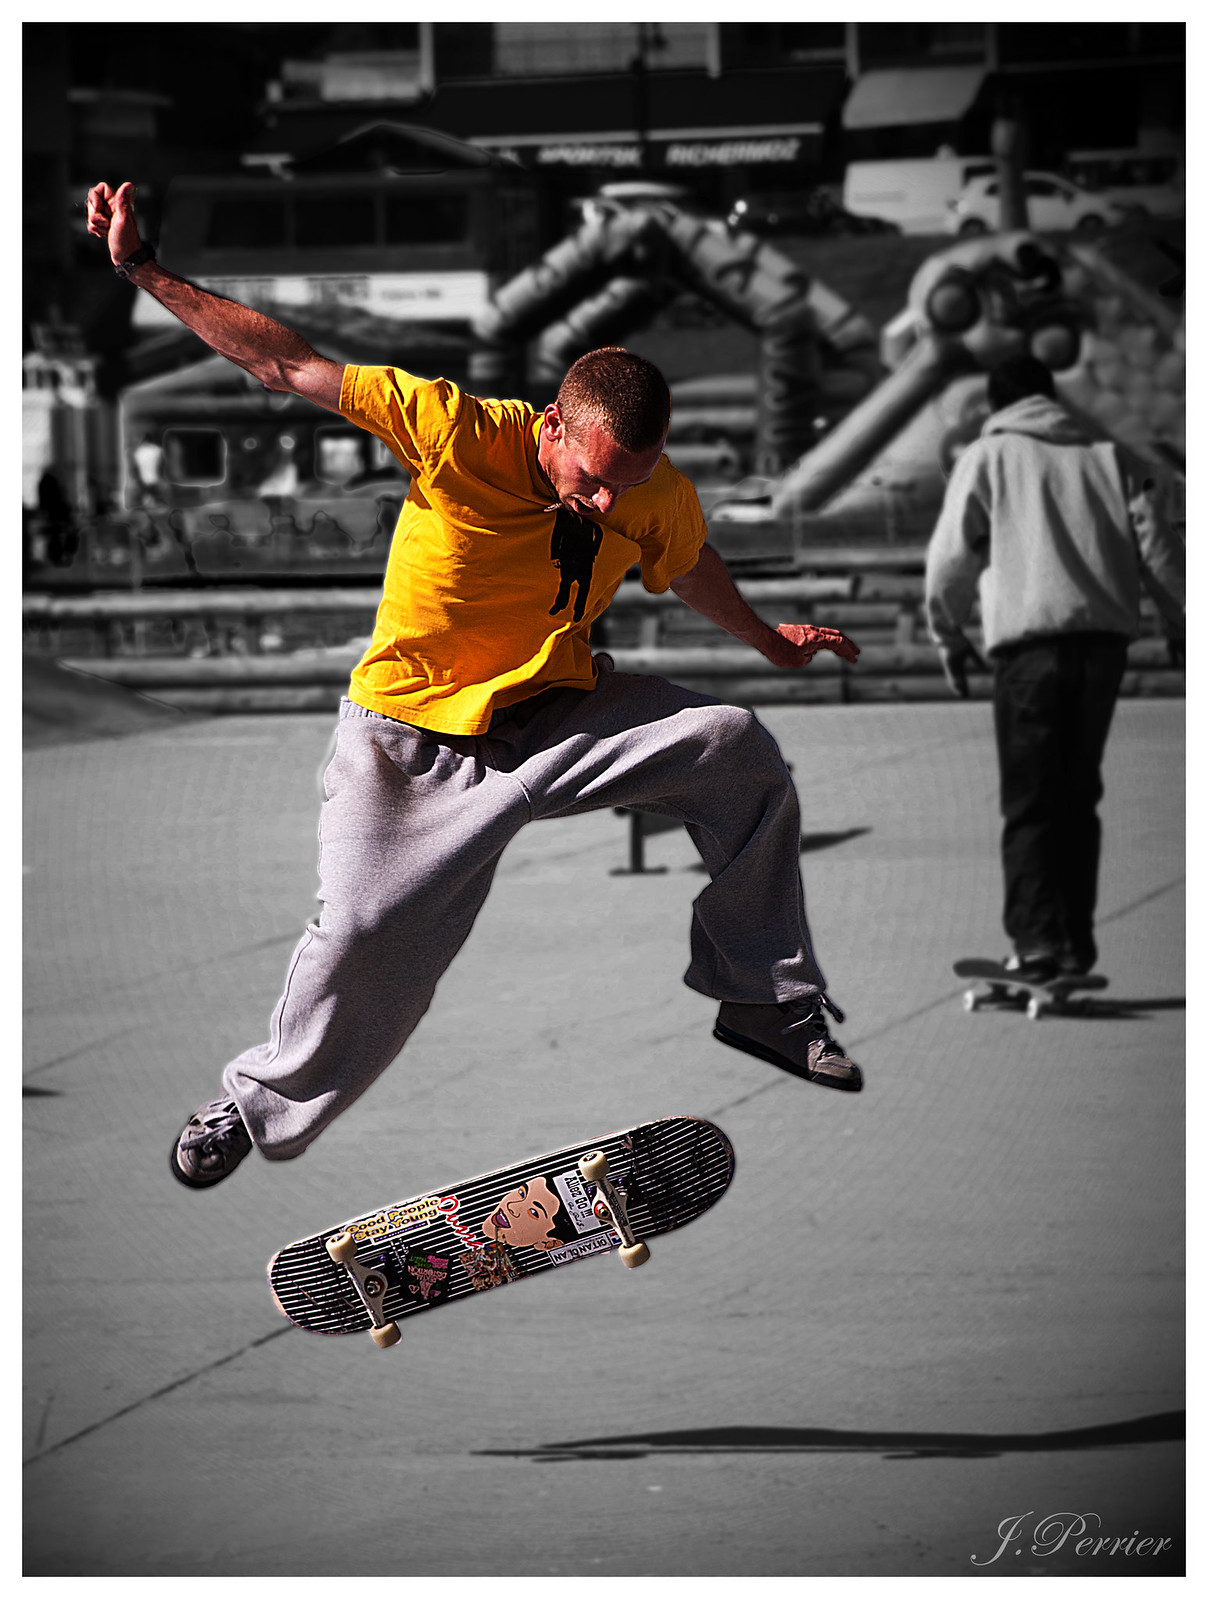 tignes été 2012 skate + BMX 7631918272_de4bc8dbc0_h